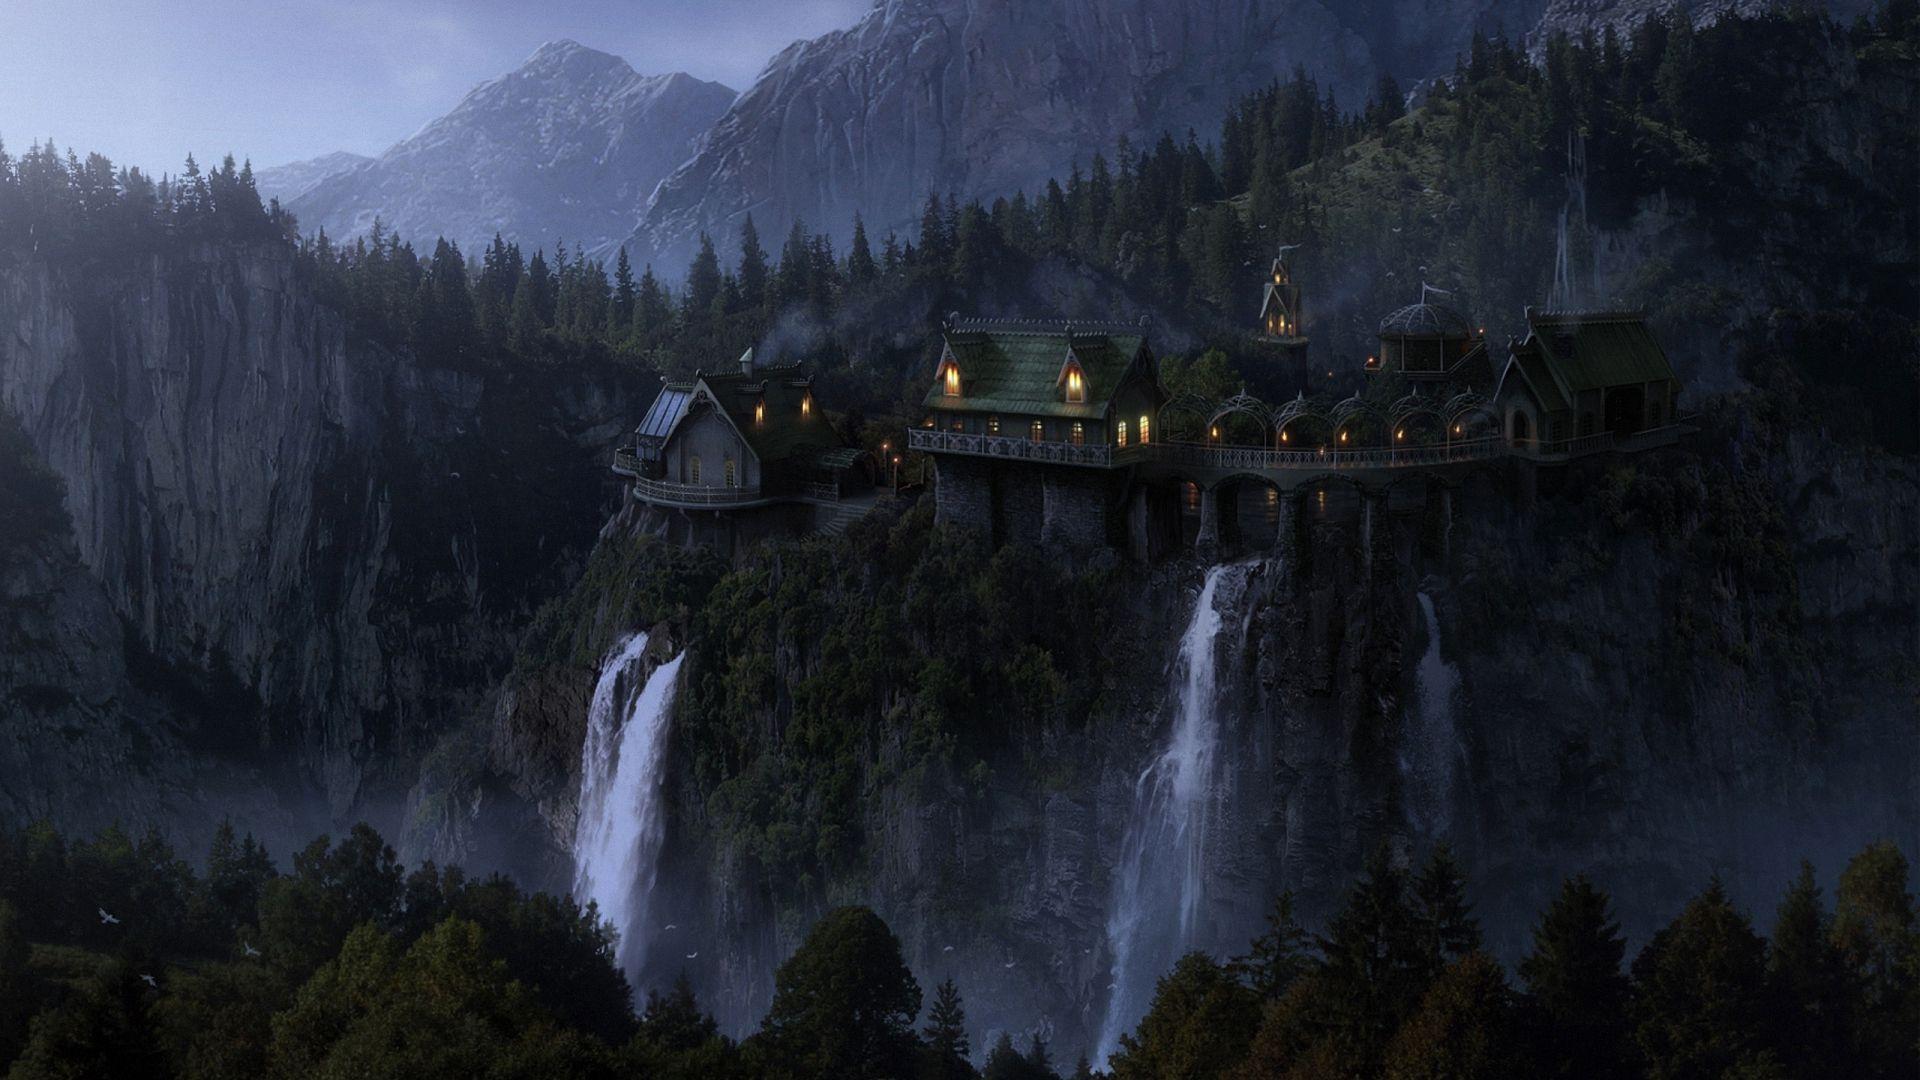 1920x1080 Fantasy Lotr Hd Wallpapers 1080p Landscape Wallpaper Fantasy Landscape Fantasy Forest